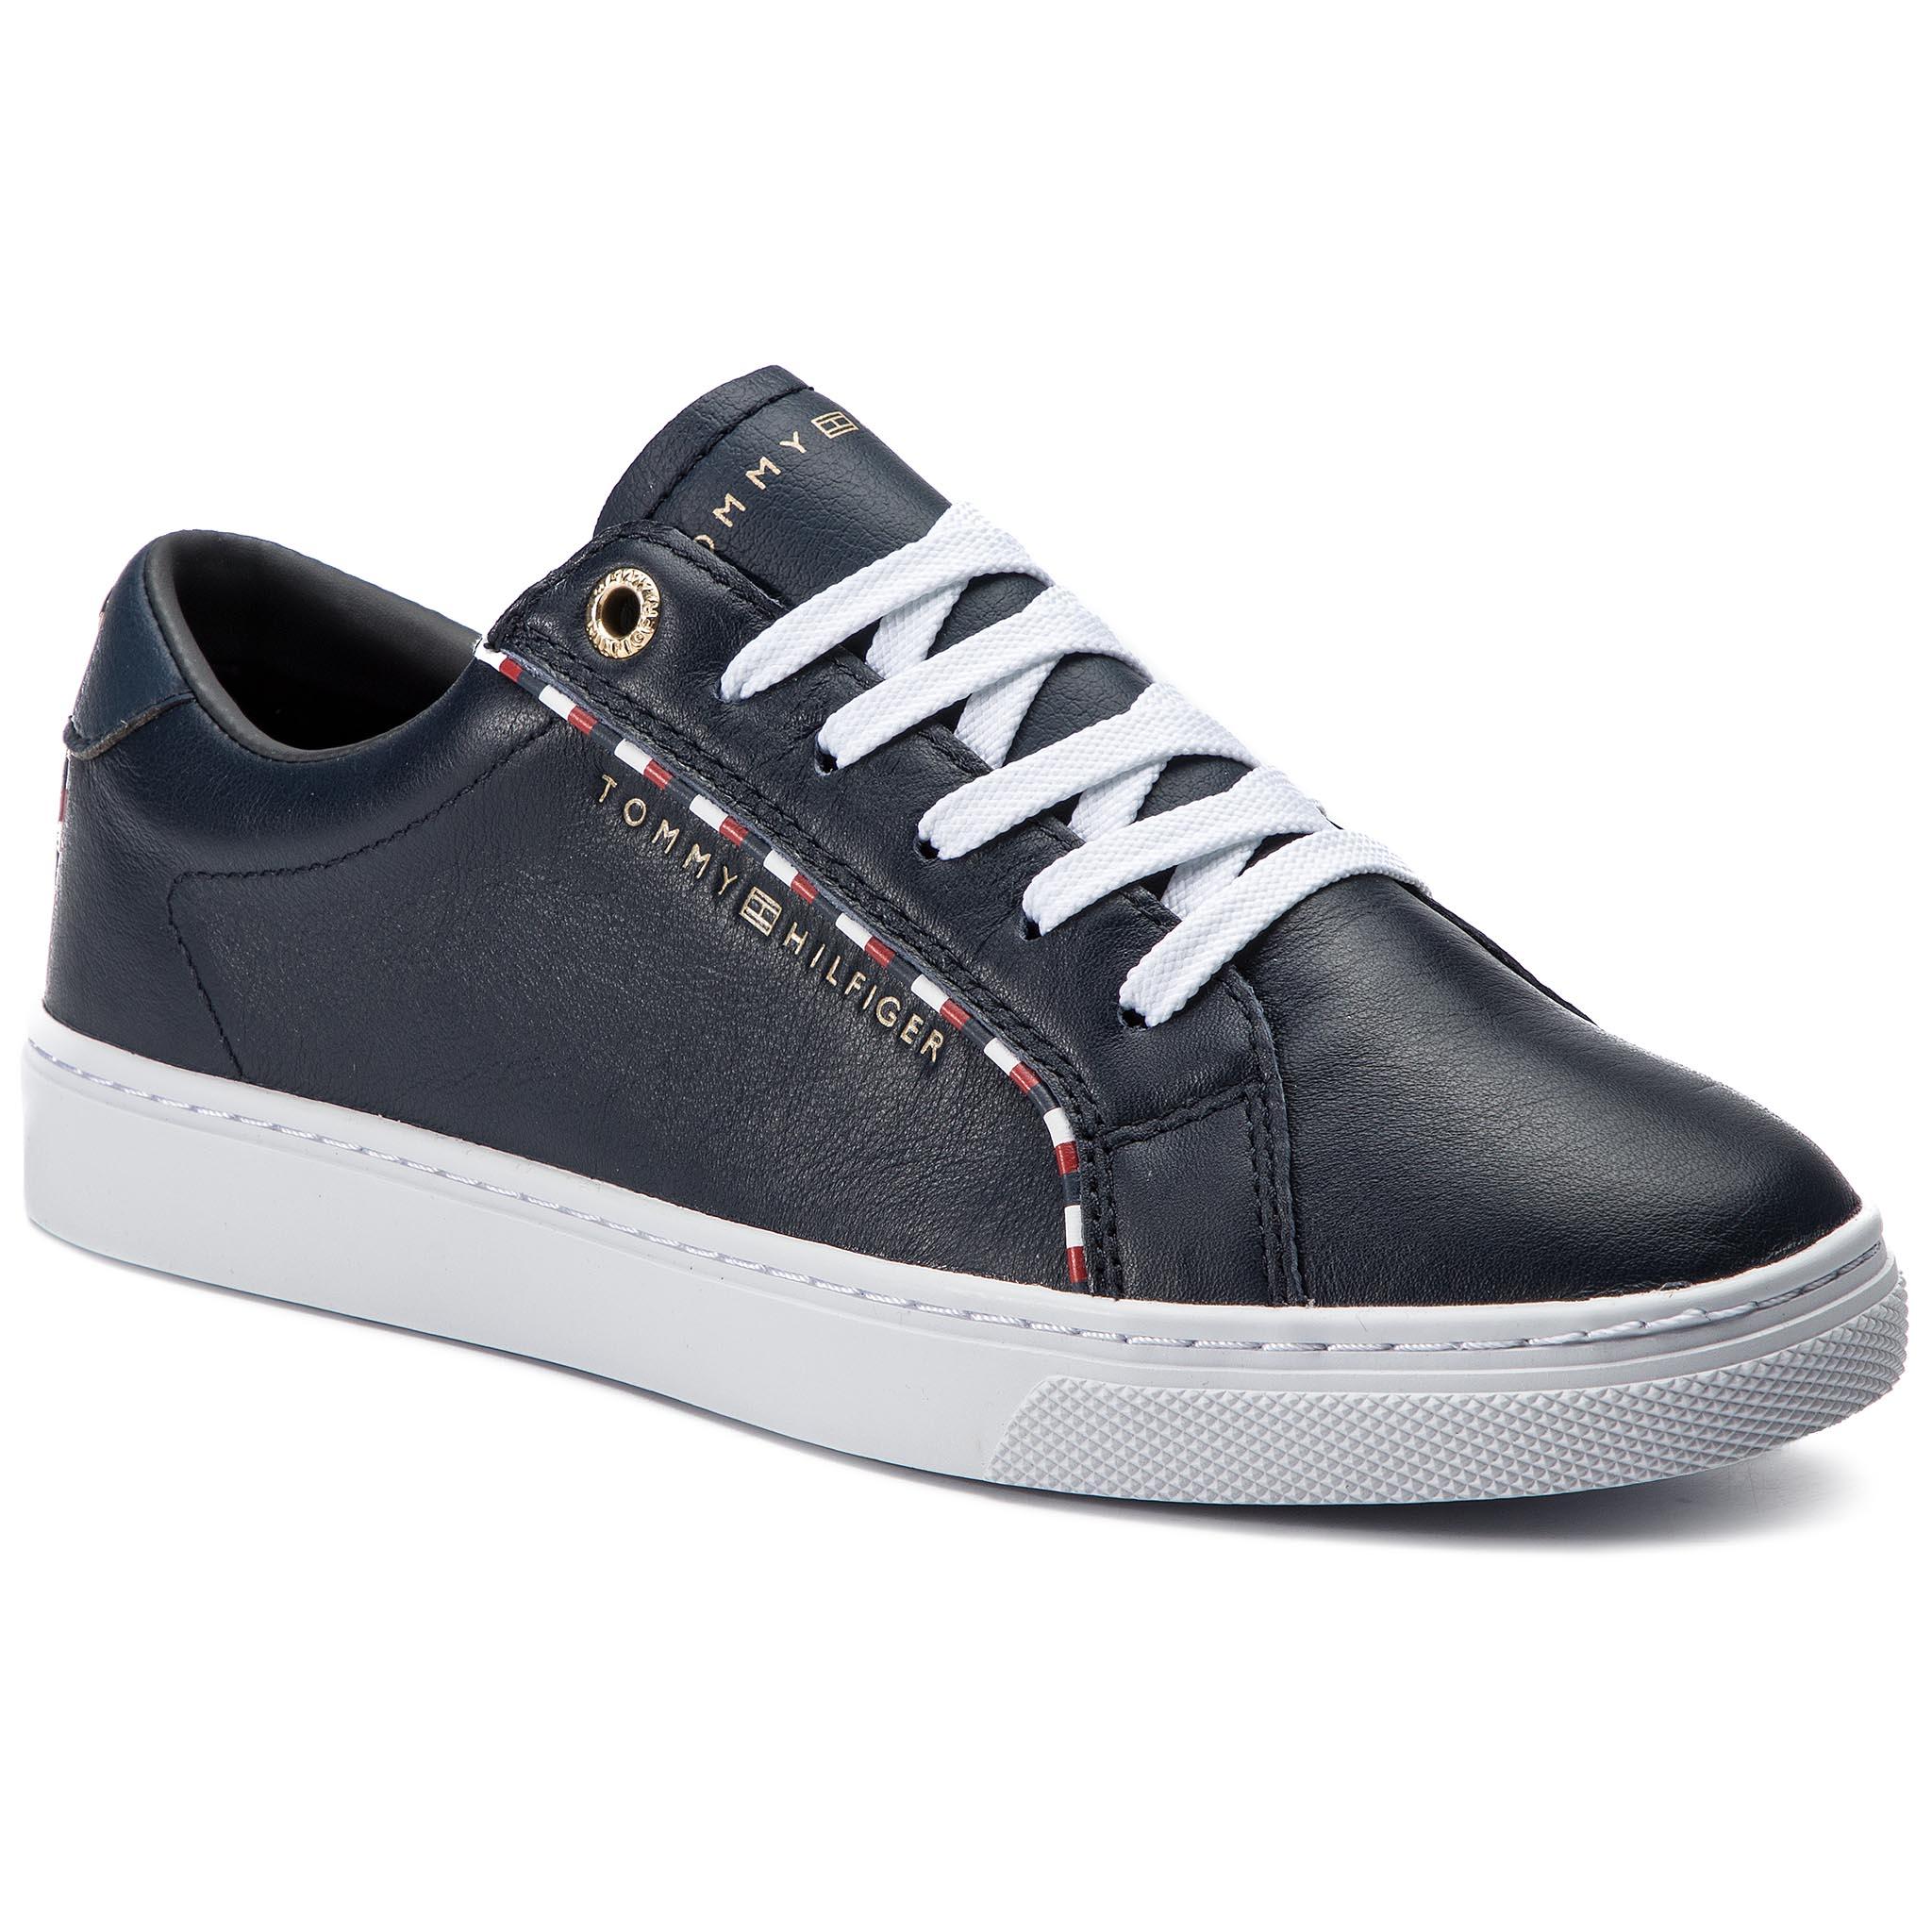 b7a55974cc Sportcipő TOMMY HILFIGER - Corporate Detail Sneaker FW0FW04149 Midnight 403